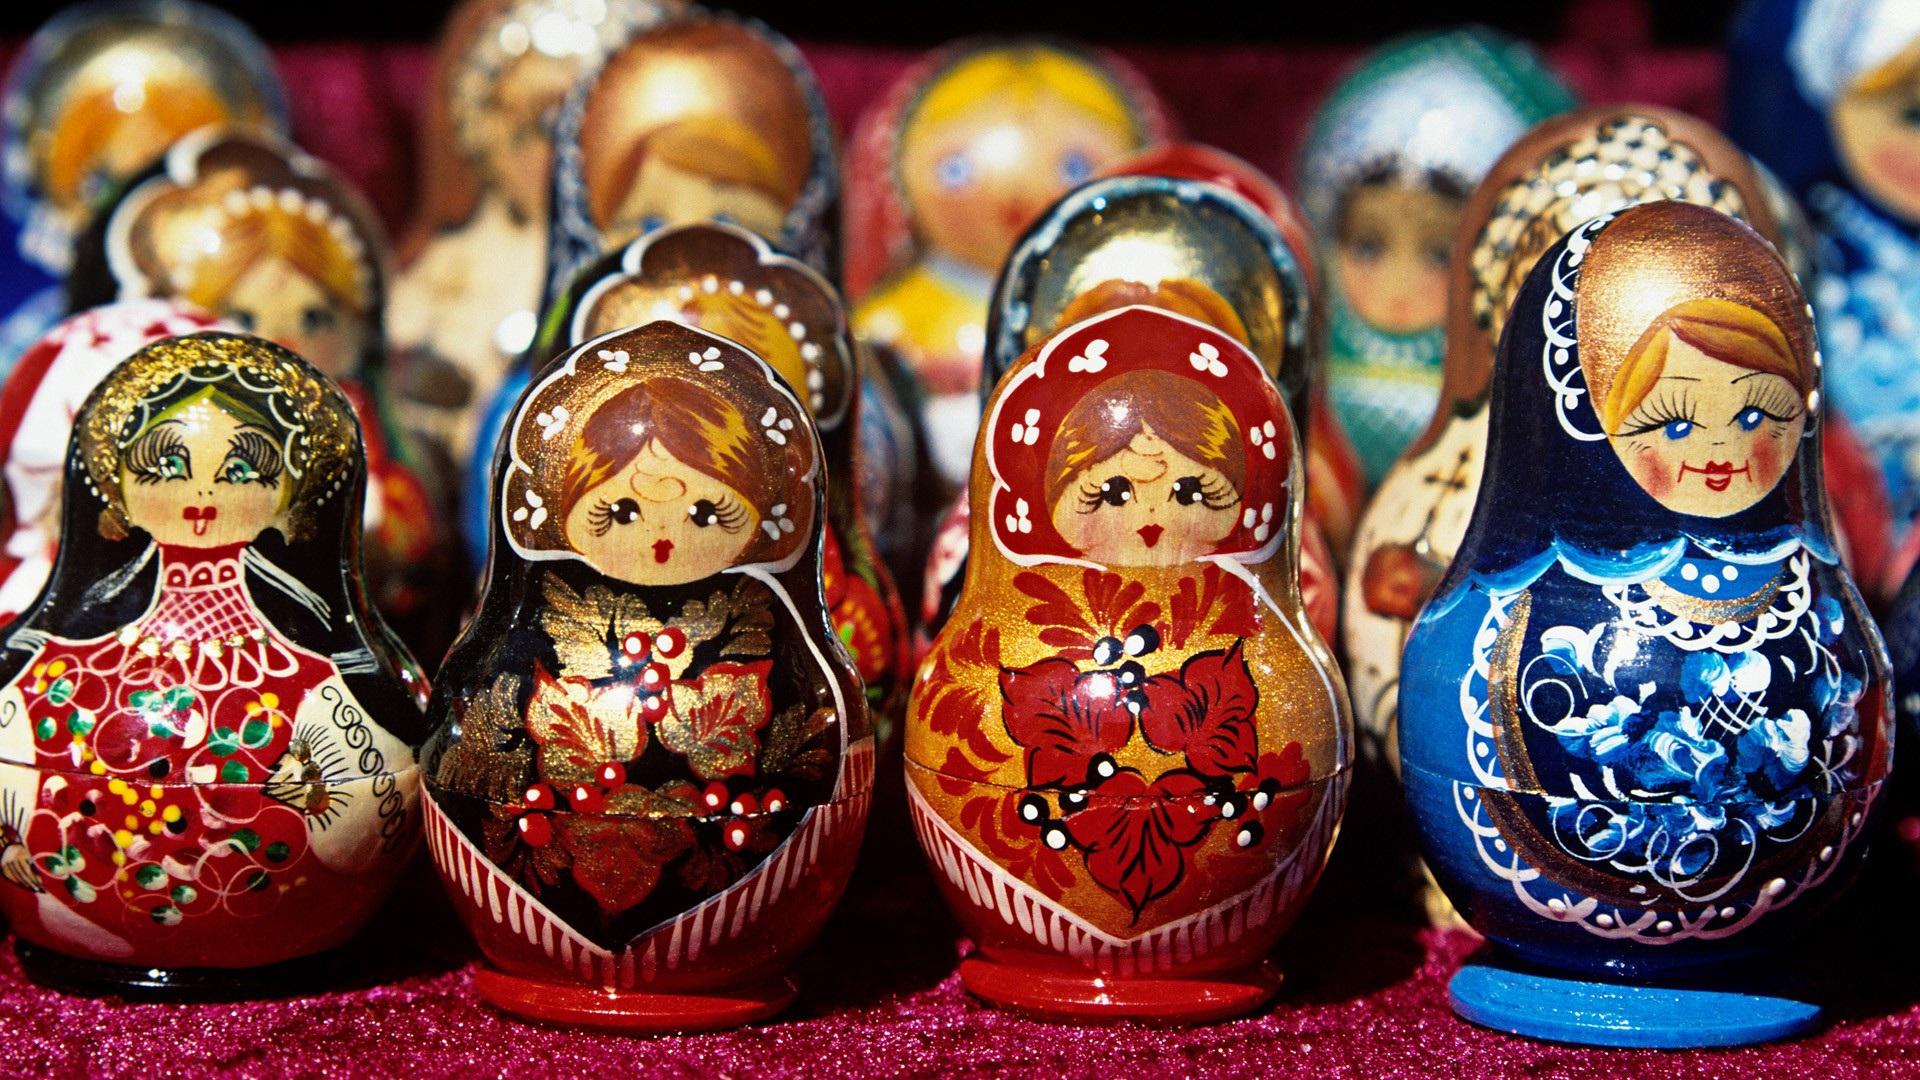 A series of matryoshka dolls